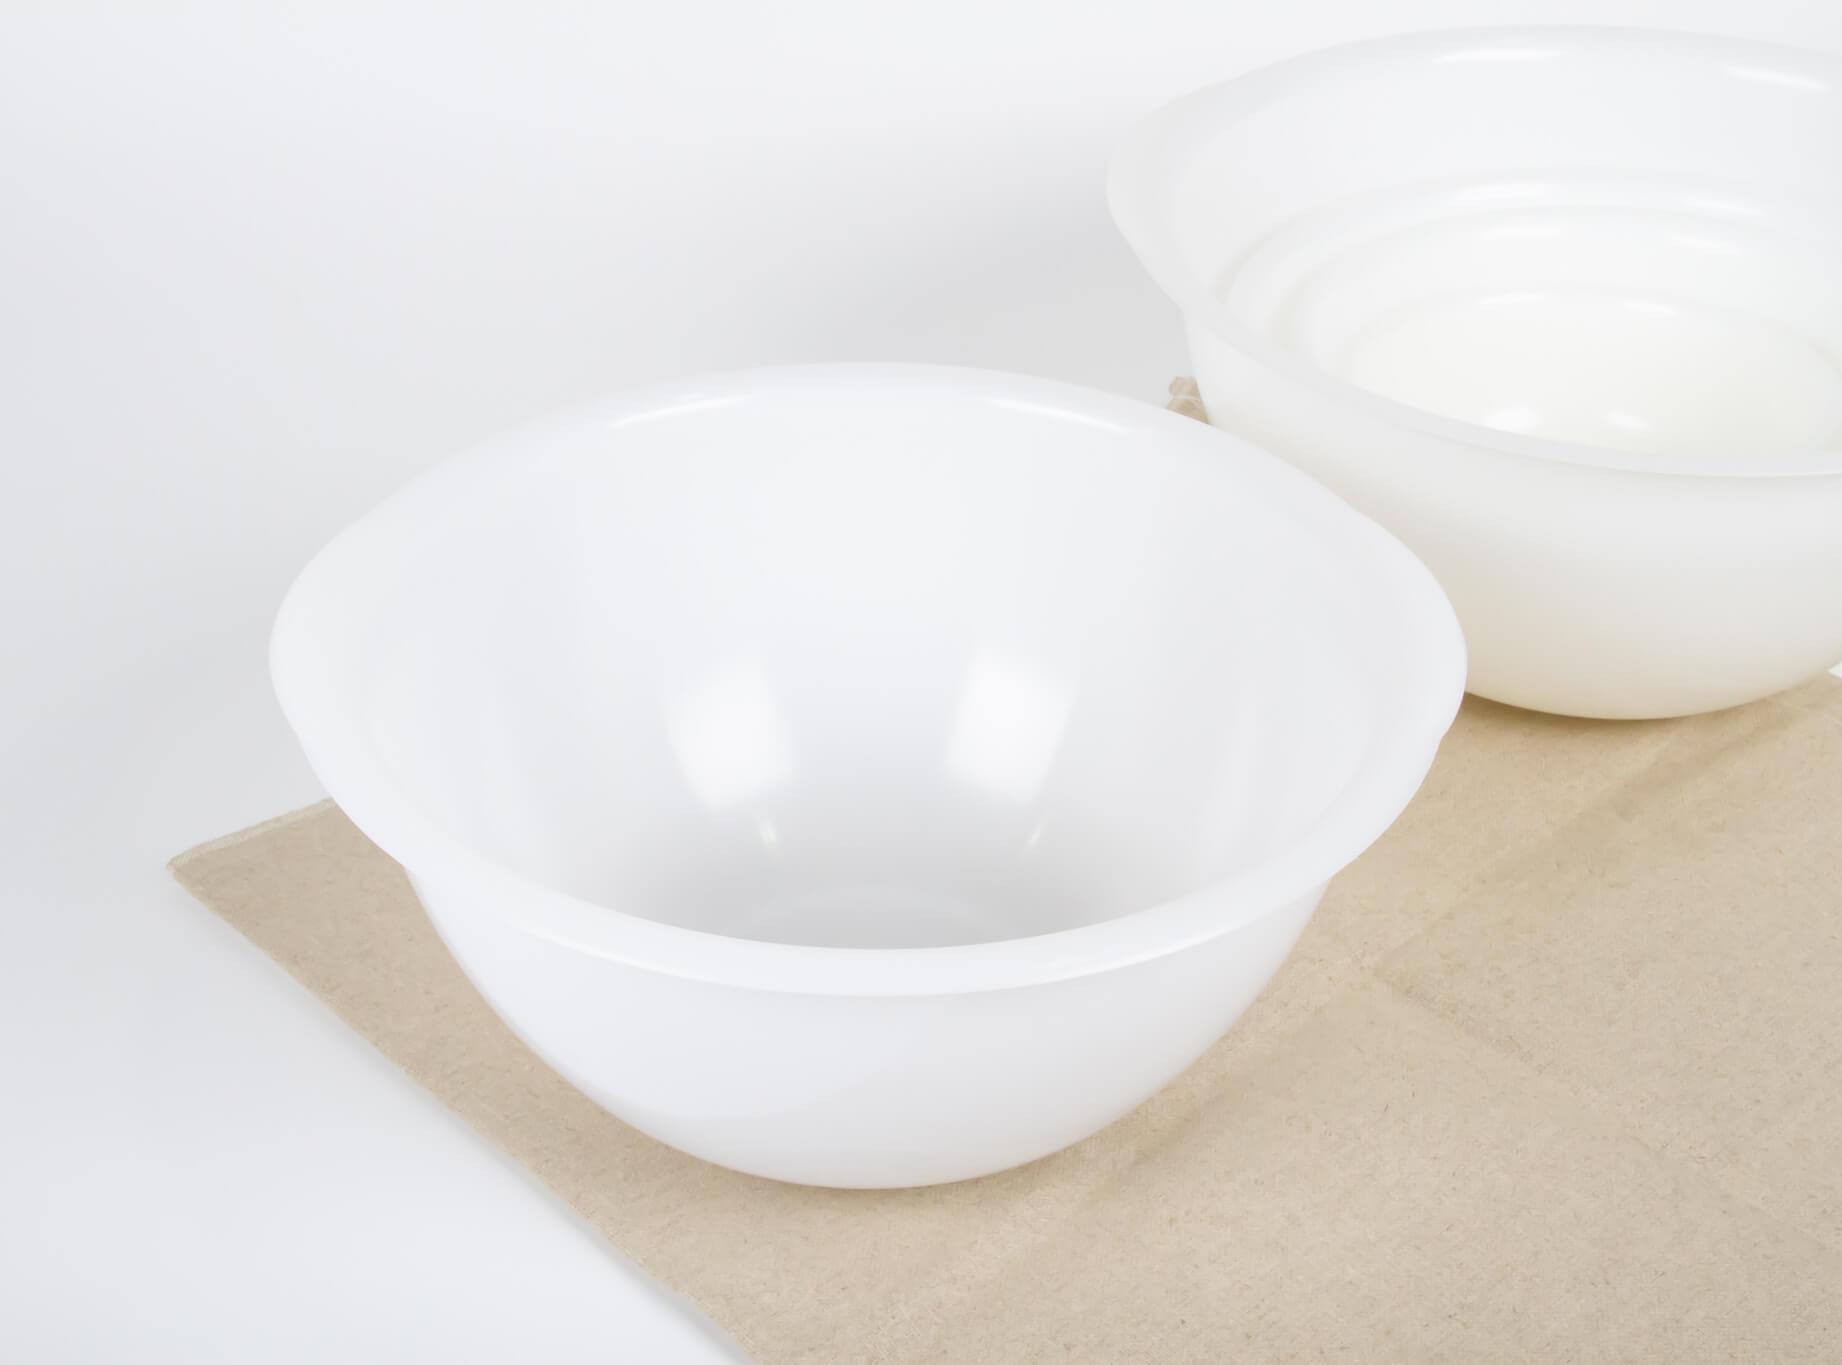 Creeds Mixing Bowls